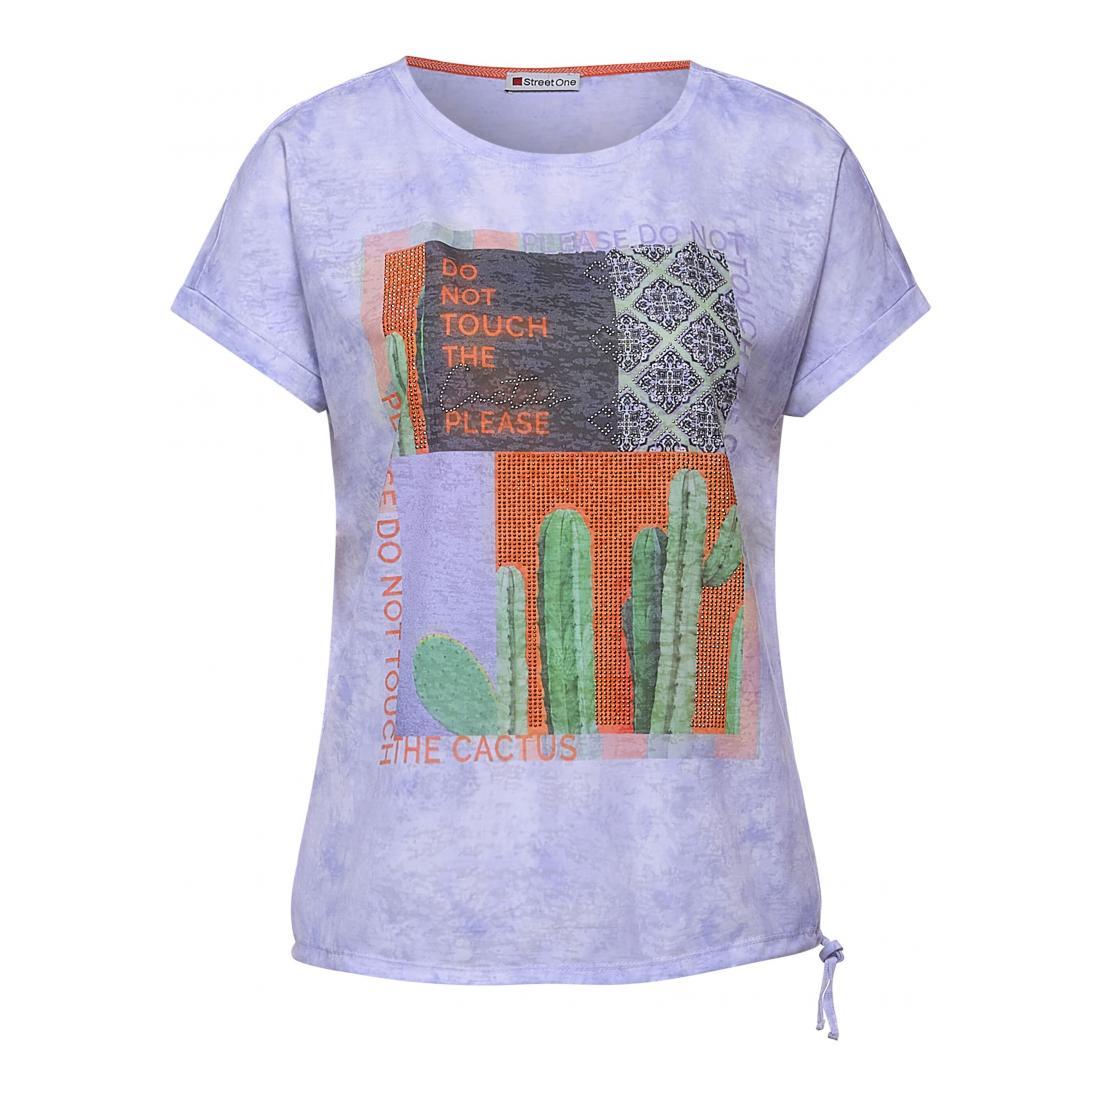 Street One T-Shirt Damen drawcord photoprint shirt